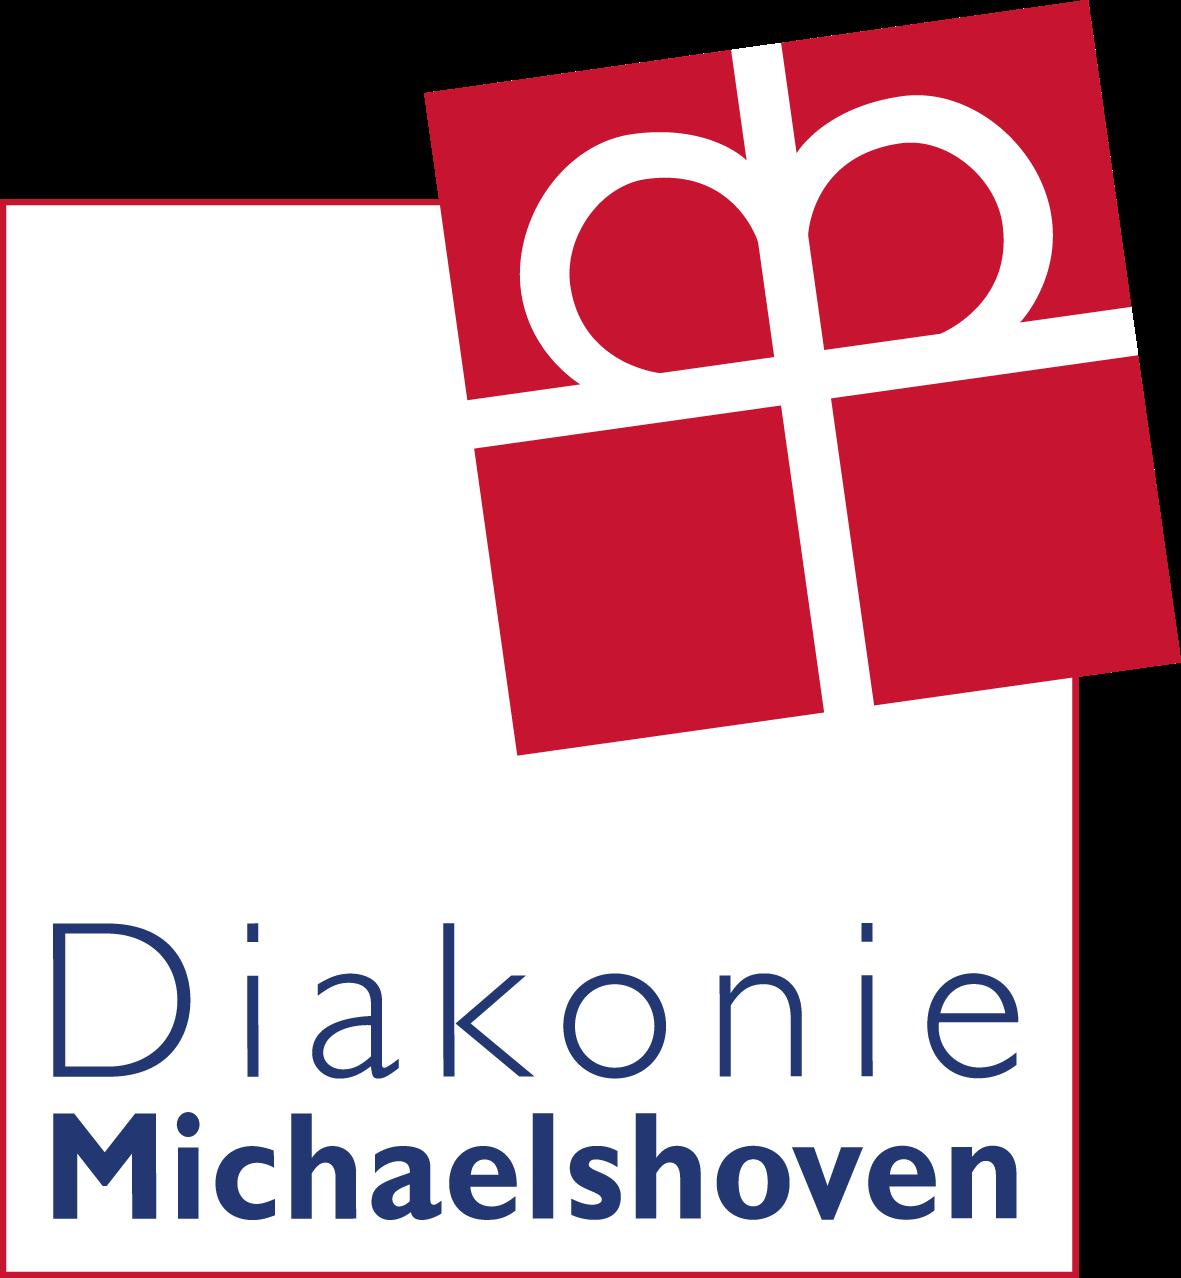 dia.Leben Michaelshoven gemeinnützige GmbH